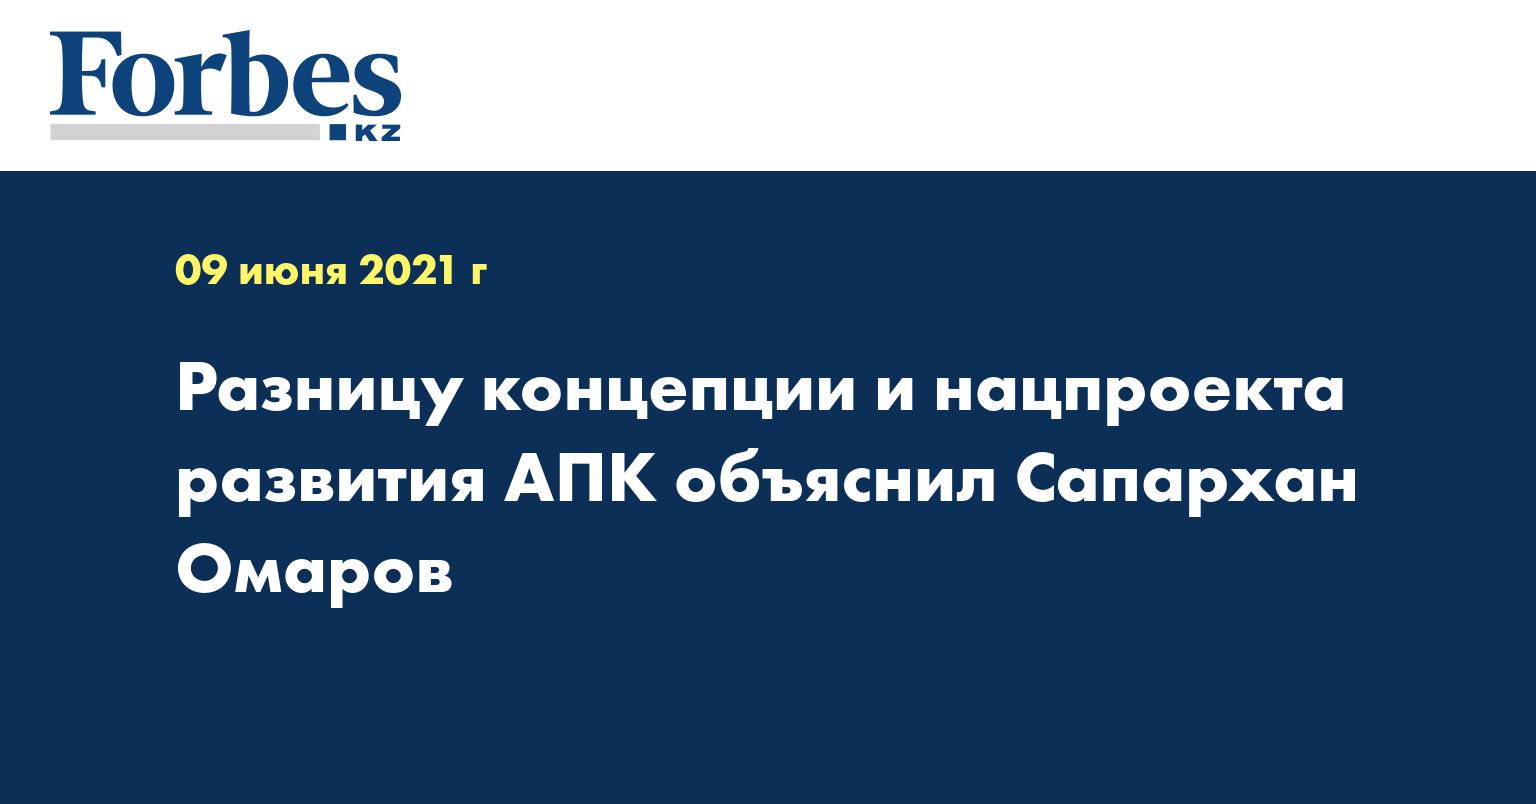 Разницу концепции и нацпроекта развития АПК объяснил Сапархан Омаров